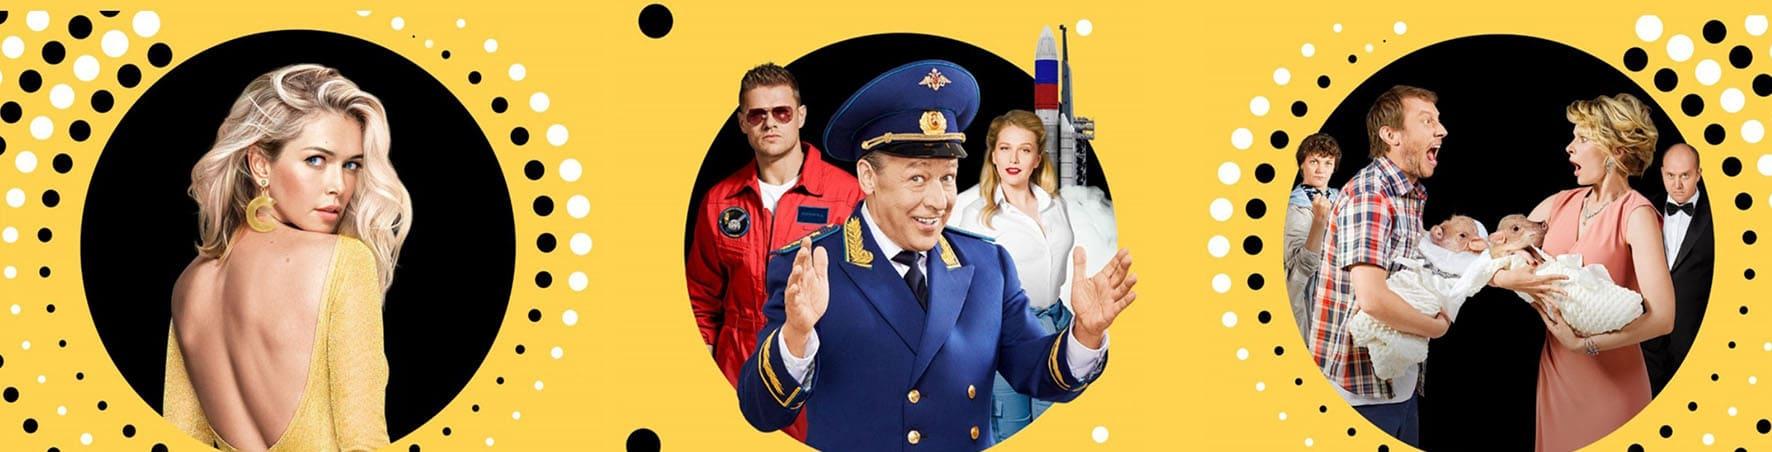 Реклама на телеканале СТС КМВ ставрополье